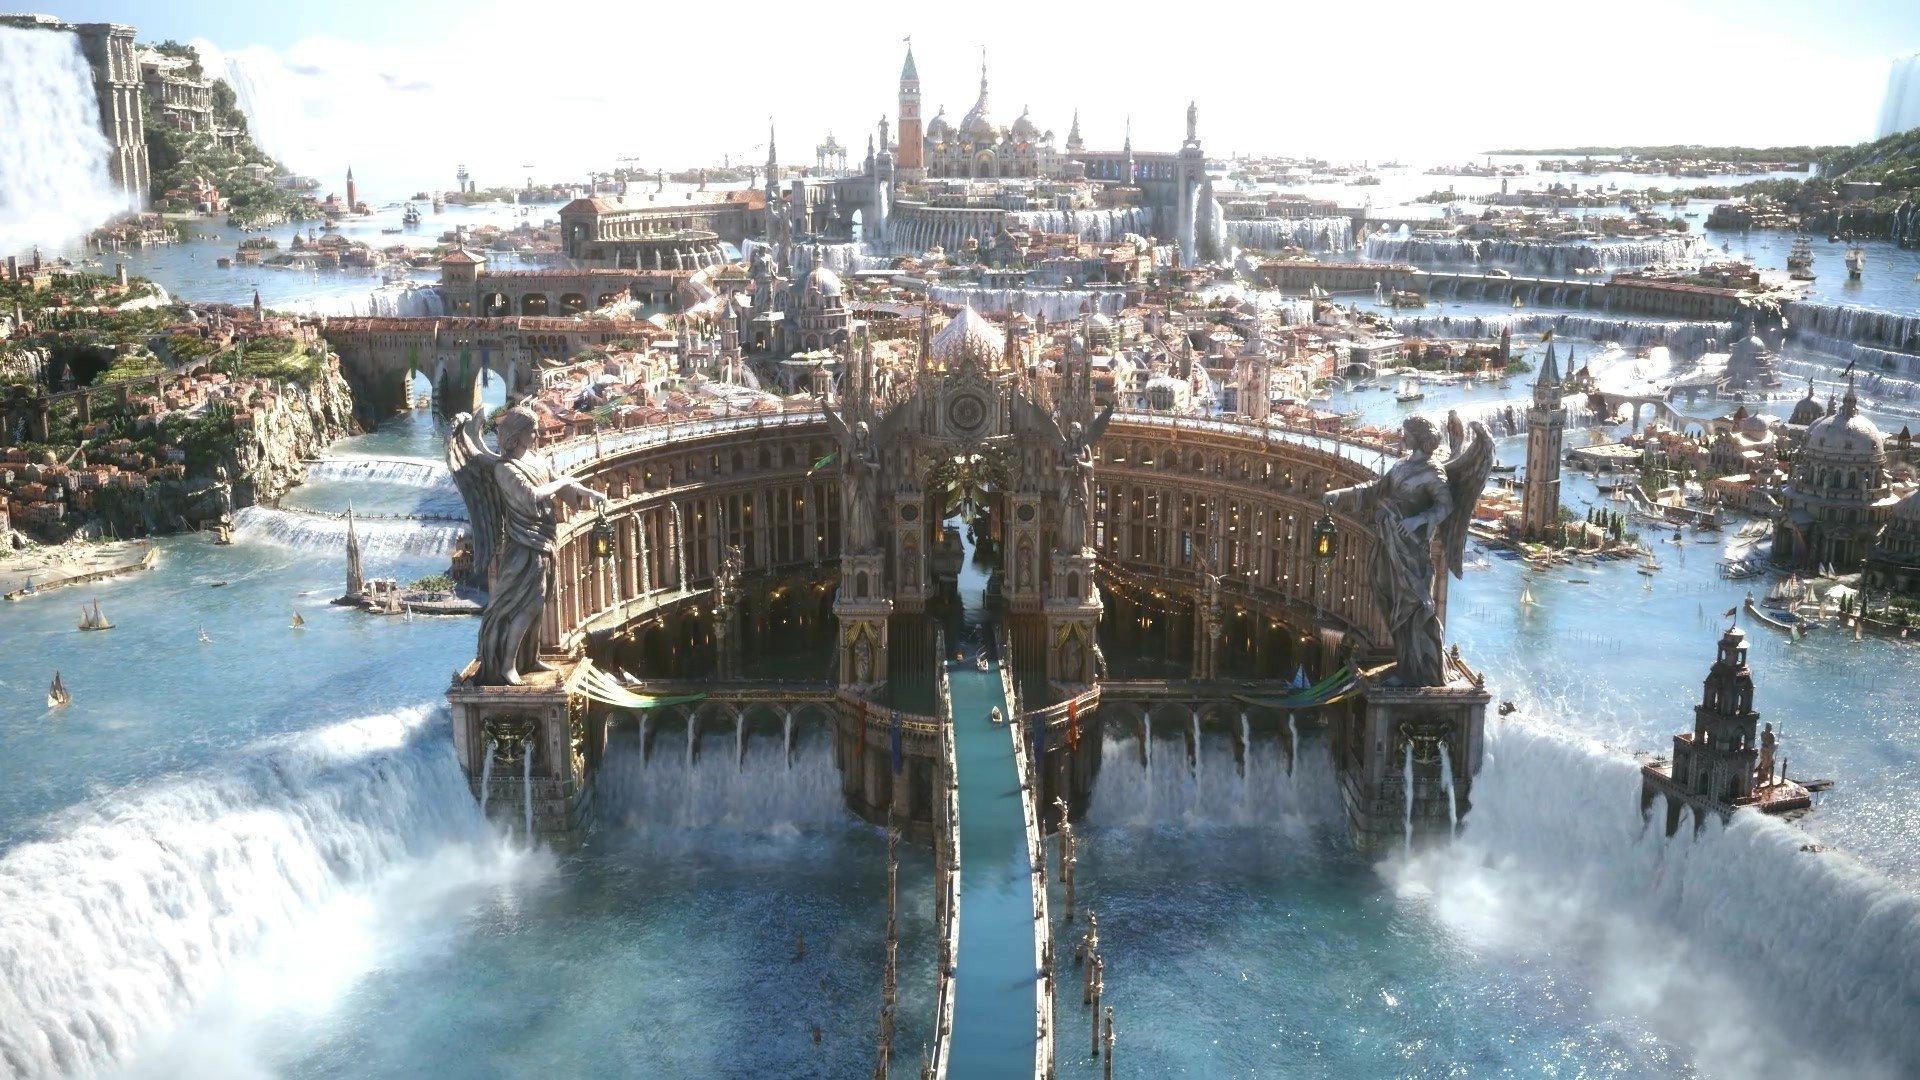 Final Fantasy Xv Wallpaper Iphone X Final Fantasy Xv Full Hd Wallpaper And Background Image